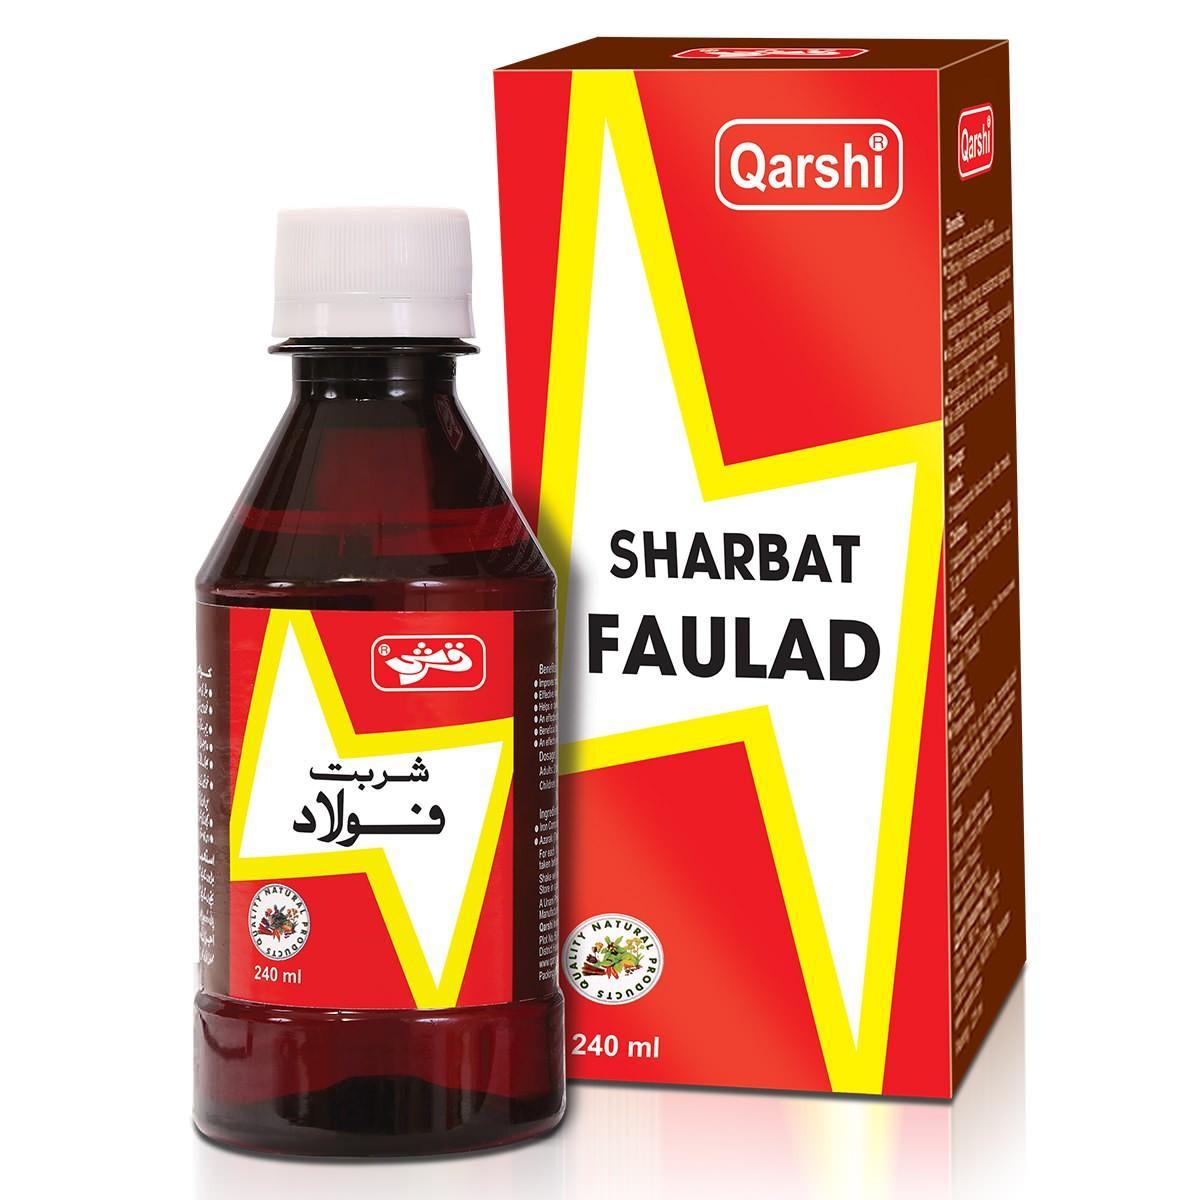 Sharbat Faulad - 240 ml